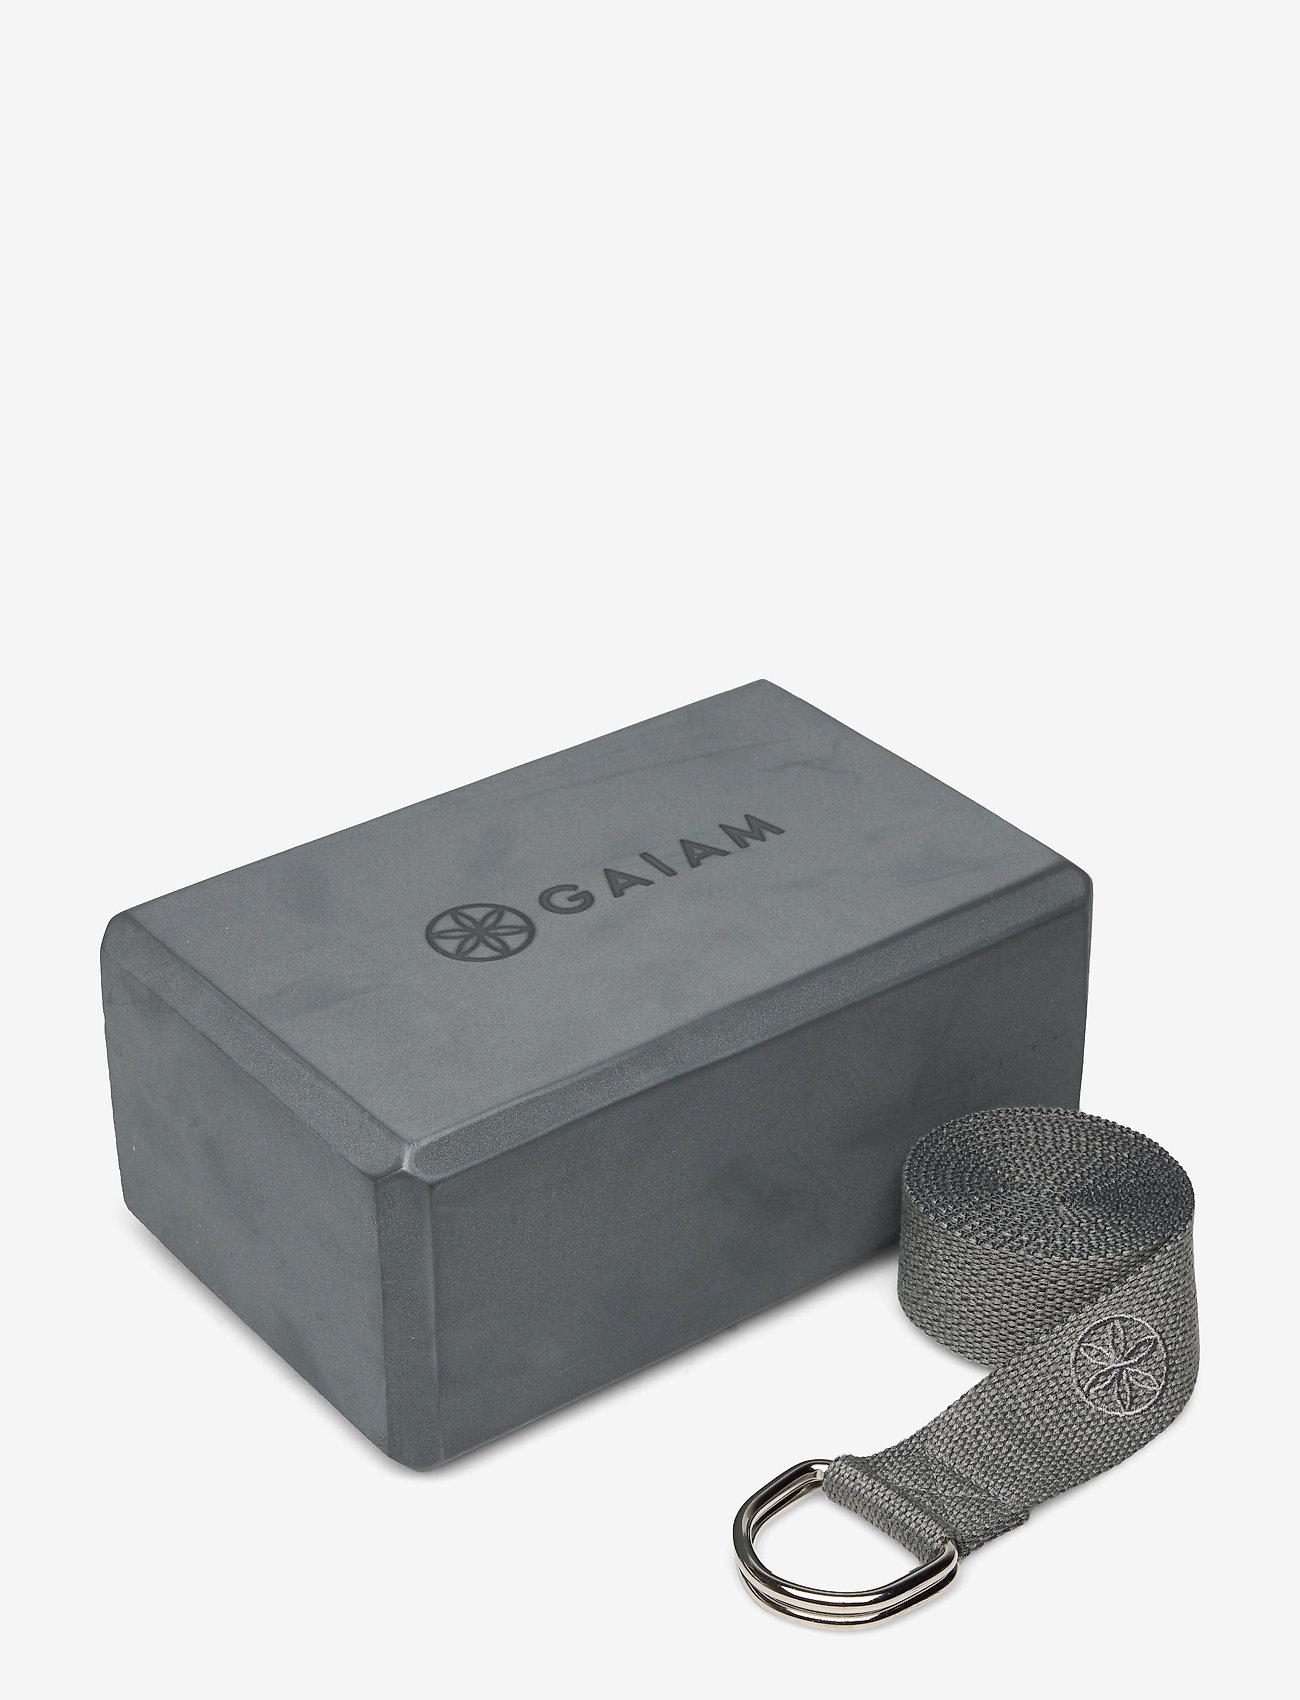 Gaiam - GAIAM BLOCK-STRAP COMBO GREY - joogablokit ja vyöt - grey - 0